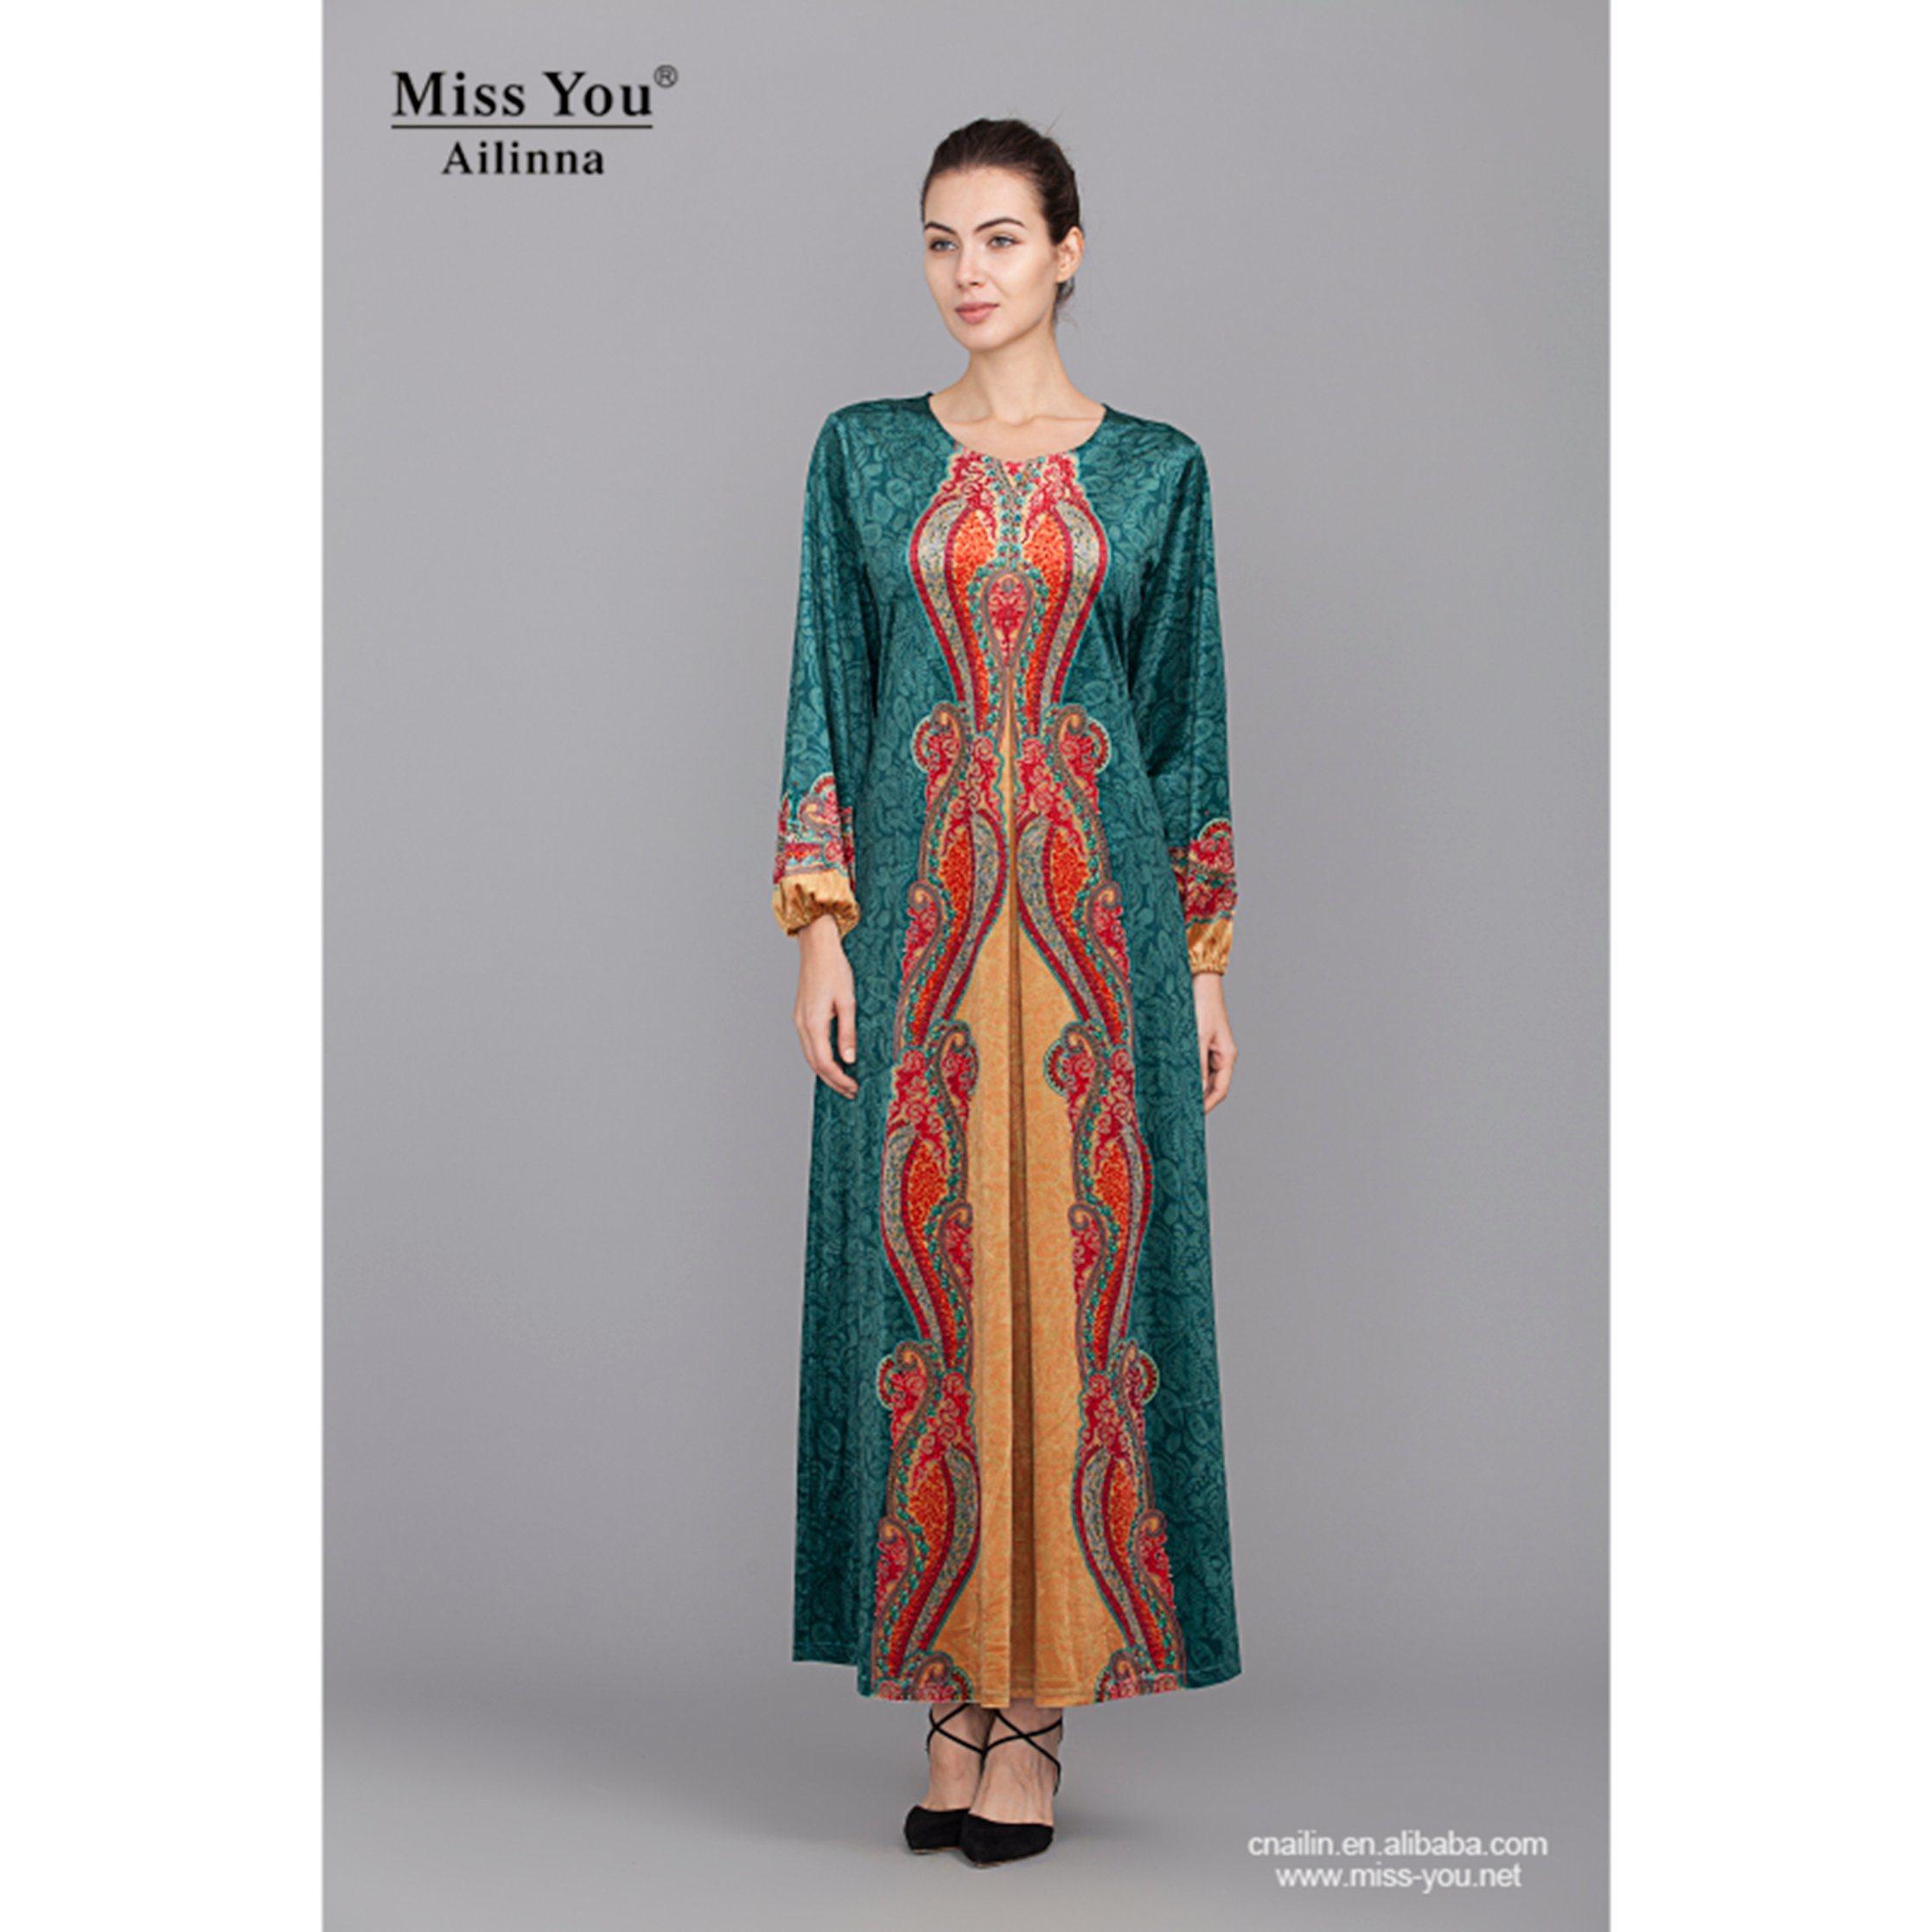 Miss You Ailinna 801972 Ladies Colorful Muslim Wedding Dress